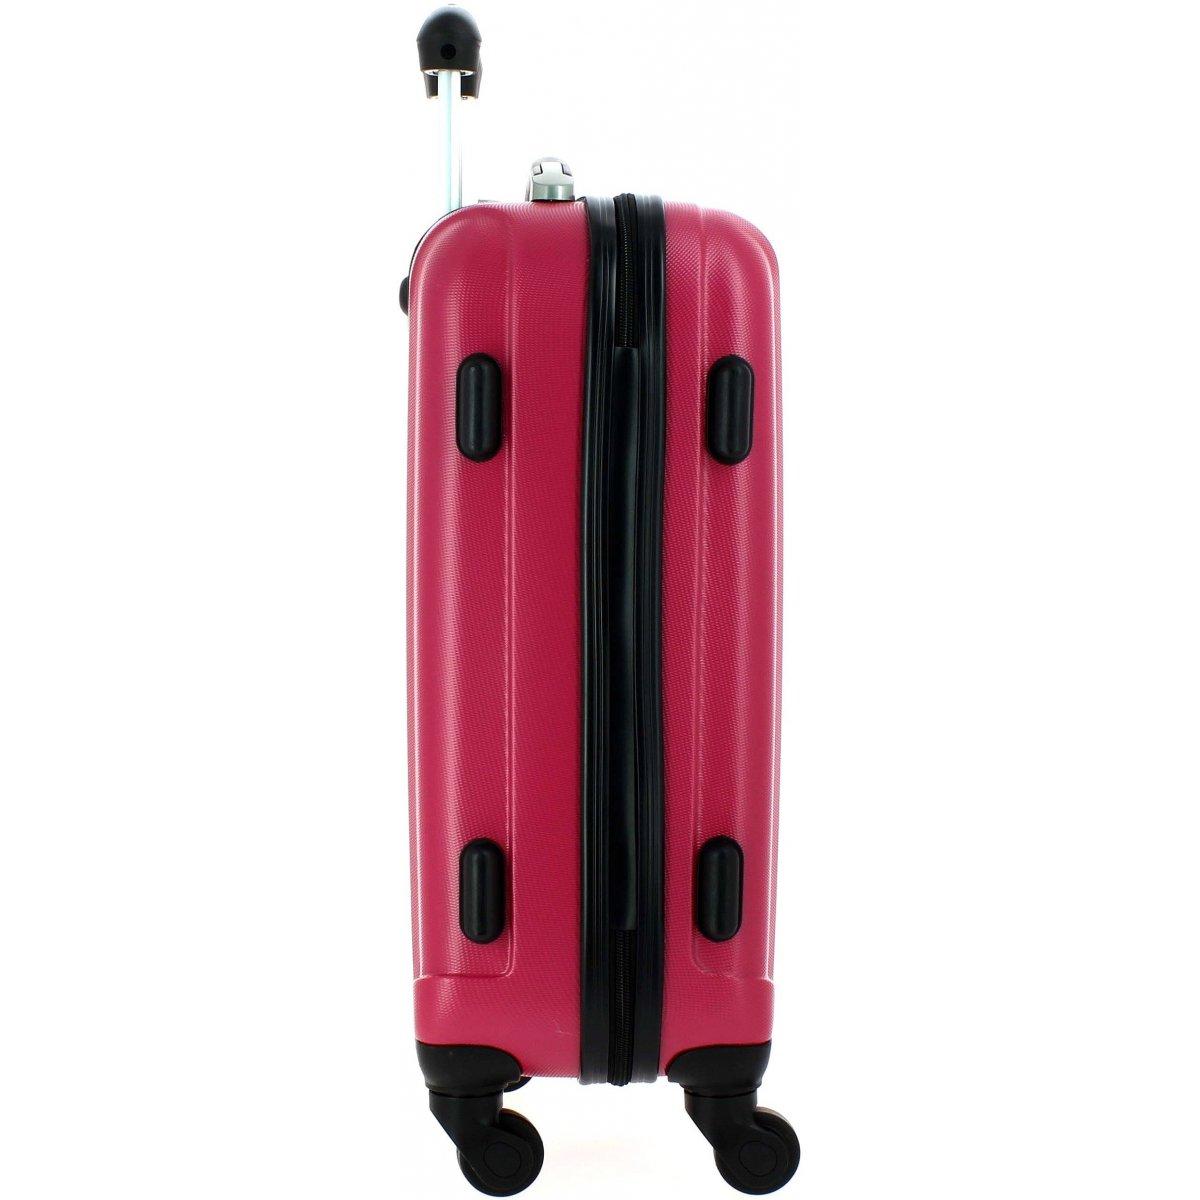 valise cabine david jones ba10111p couleur principale fushia promotion. Black Bedroom Furniture Sets. Home Design Ideas